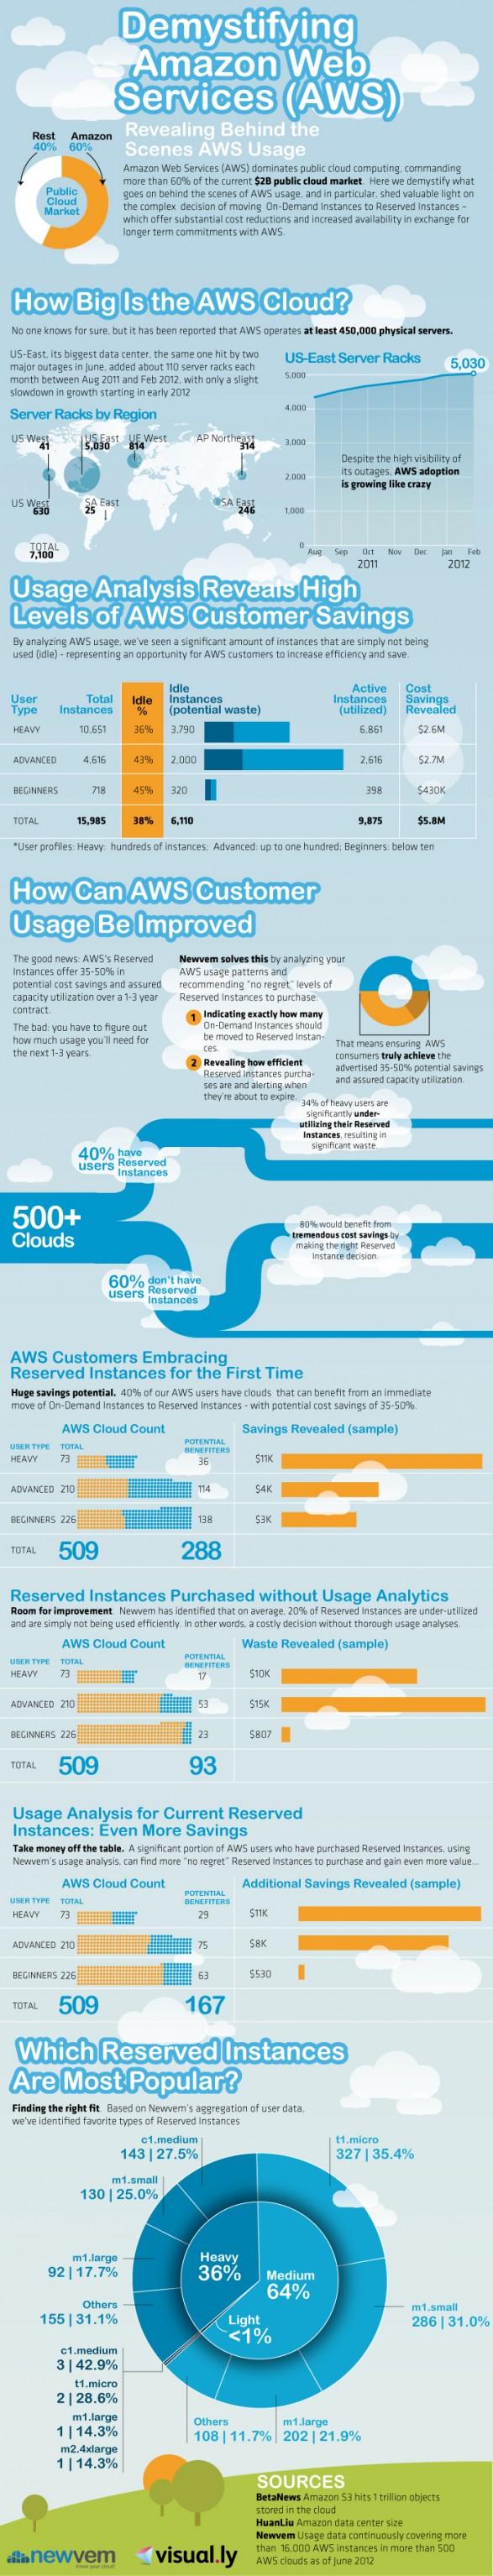 Demystifying Amazon Web Services